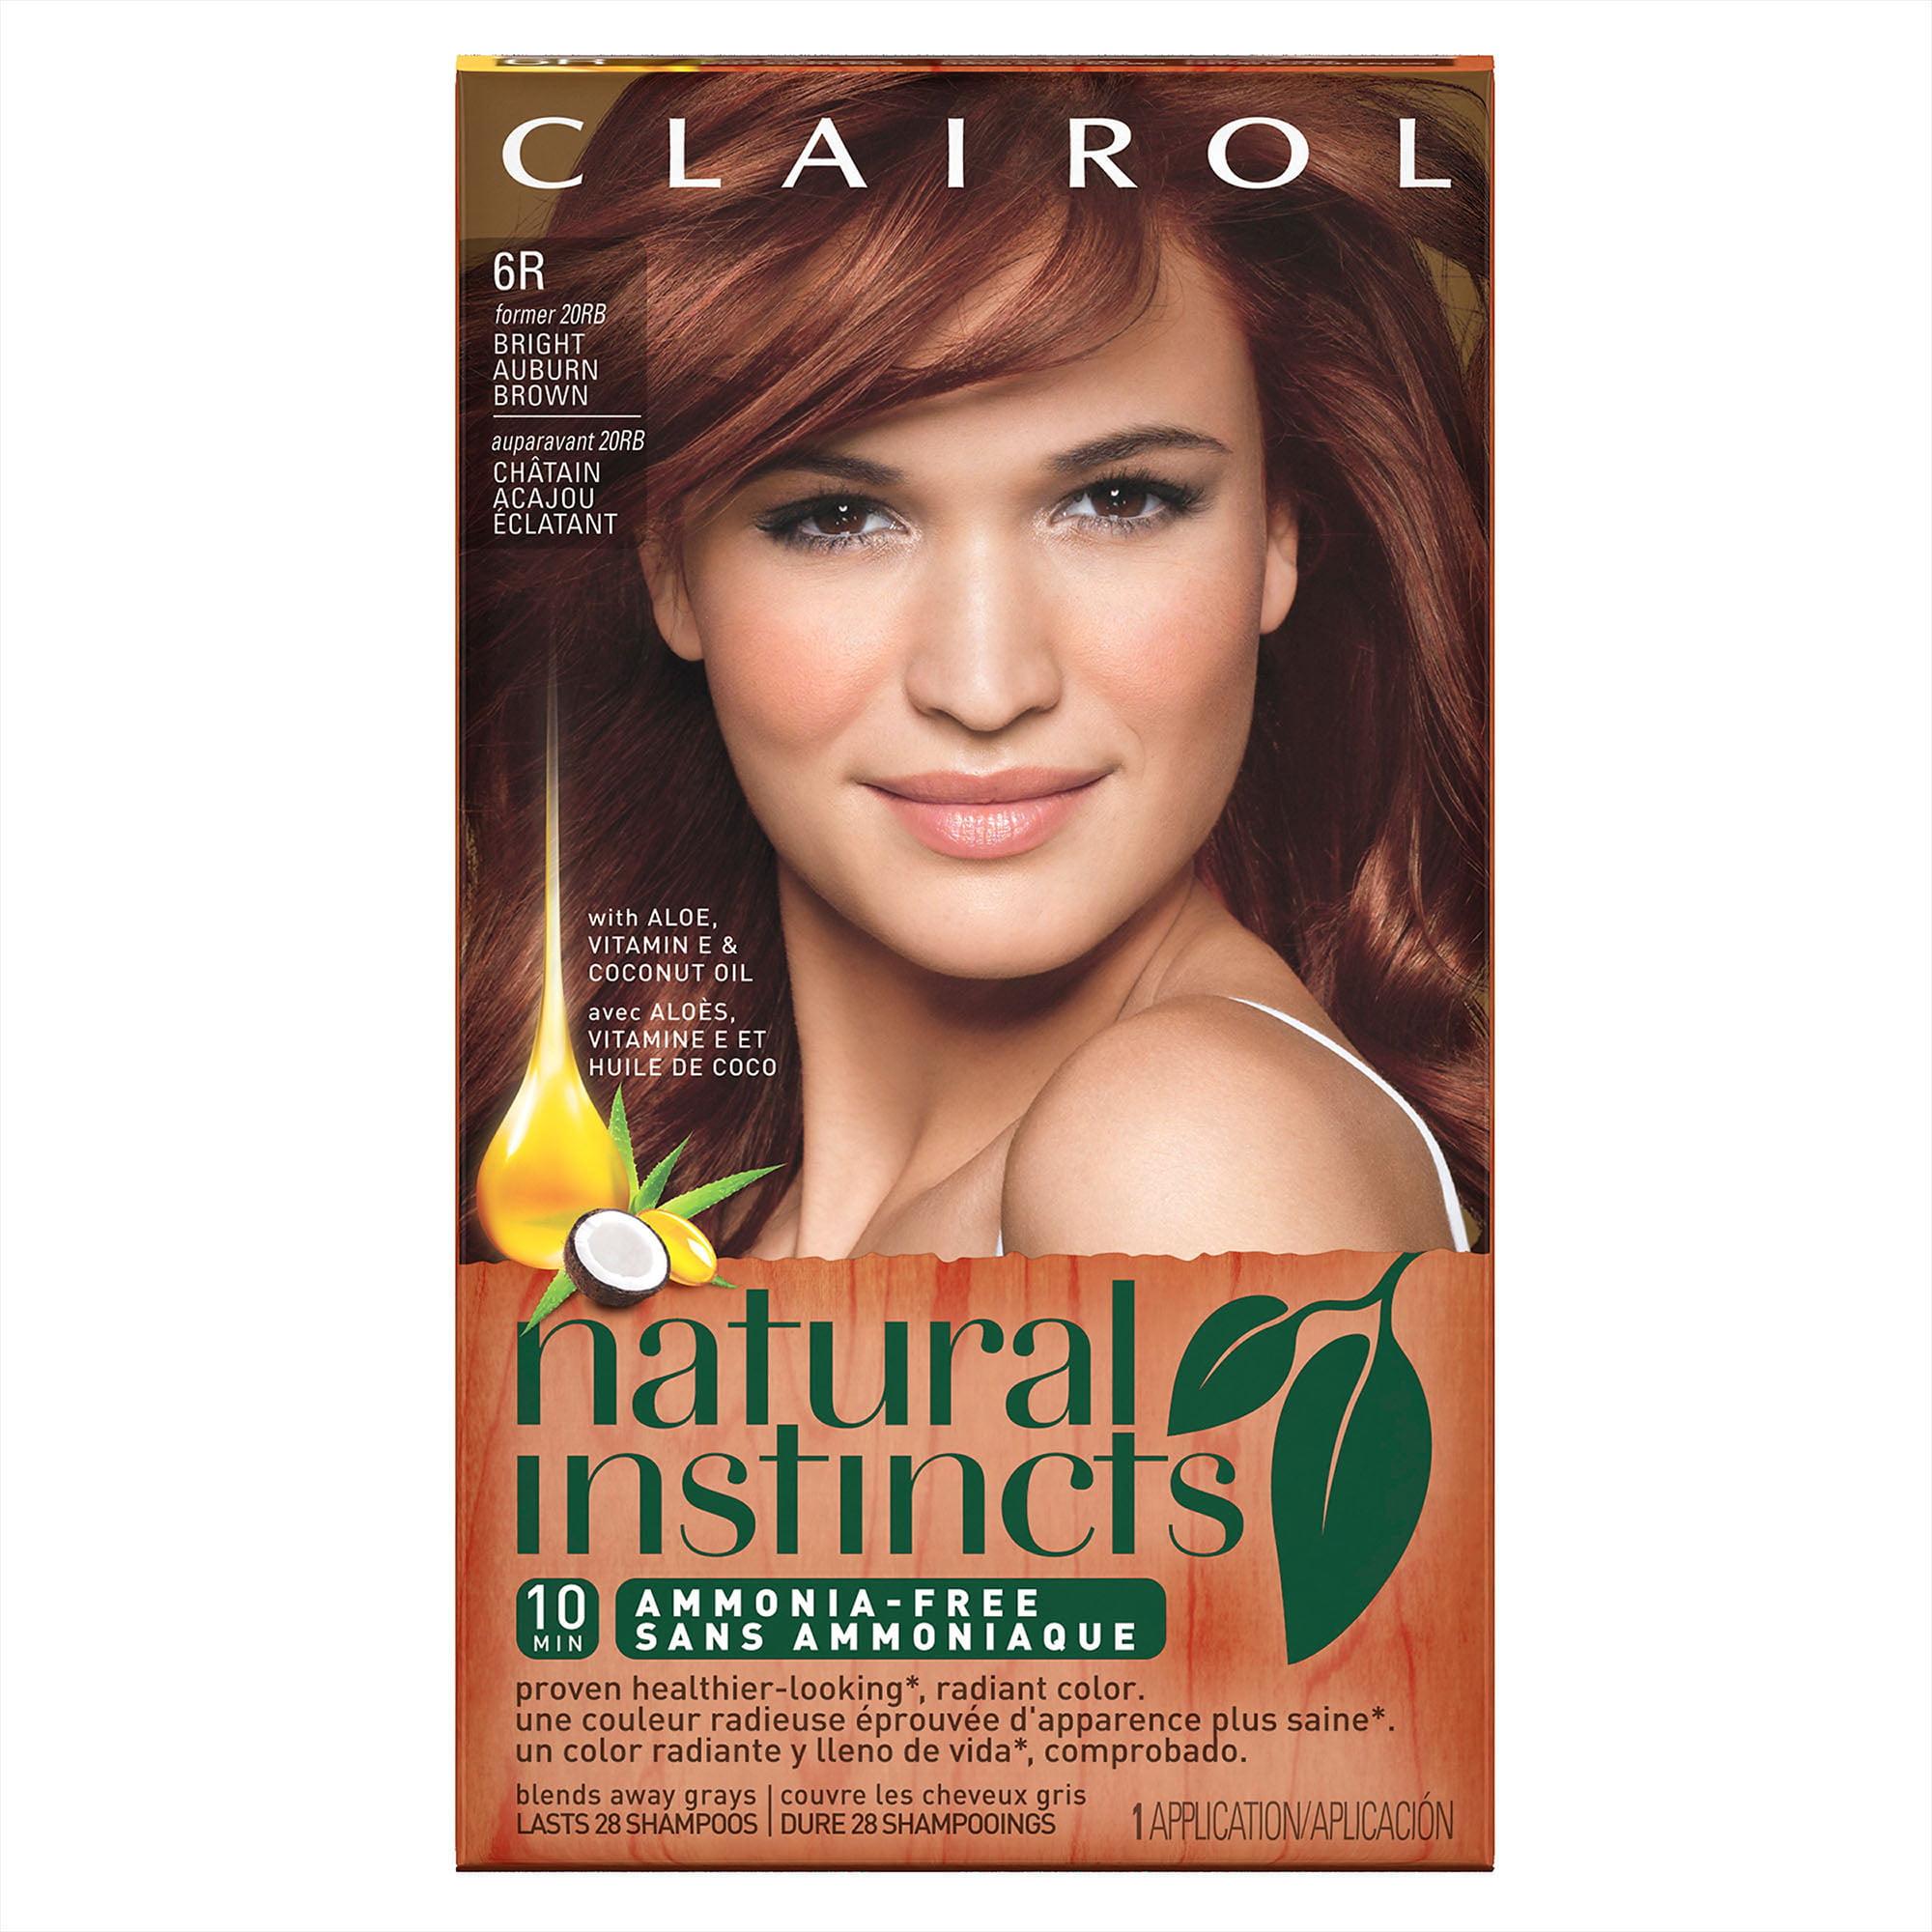 Clairol Natural Instincts Semi Permanent Hair Color